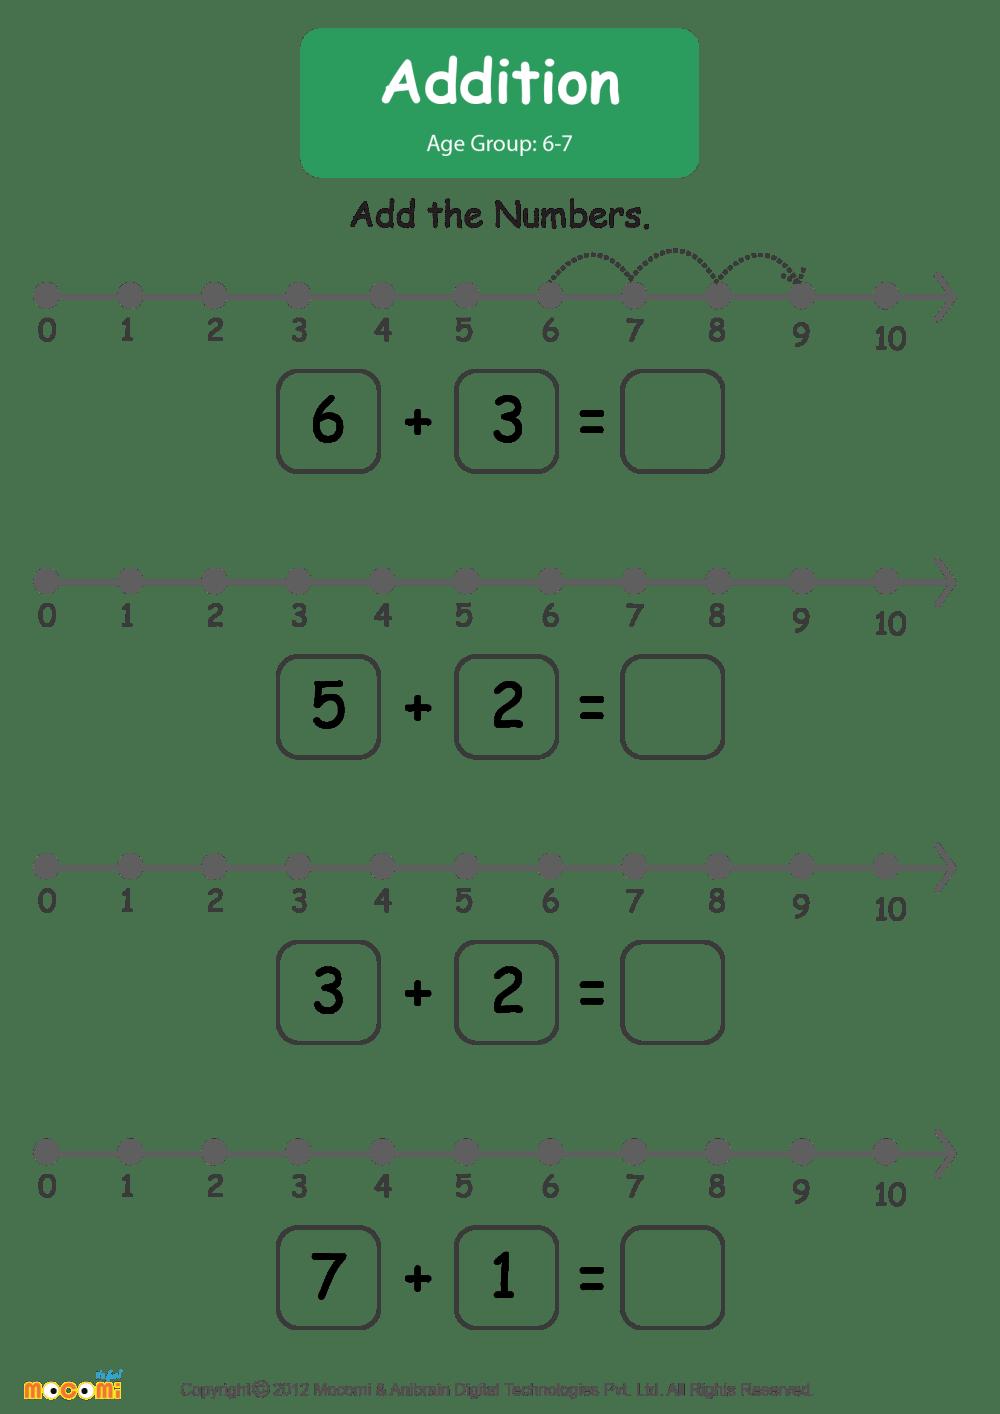 medium resolution of Addition Worksheet - Math for Kids   Mocomi